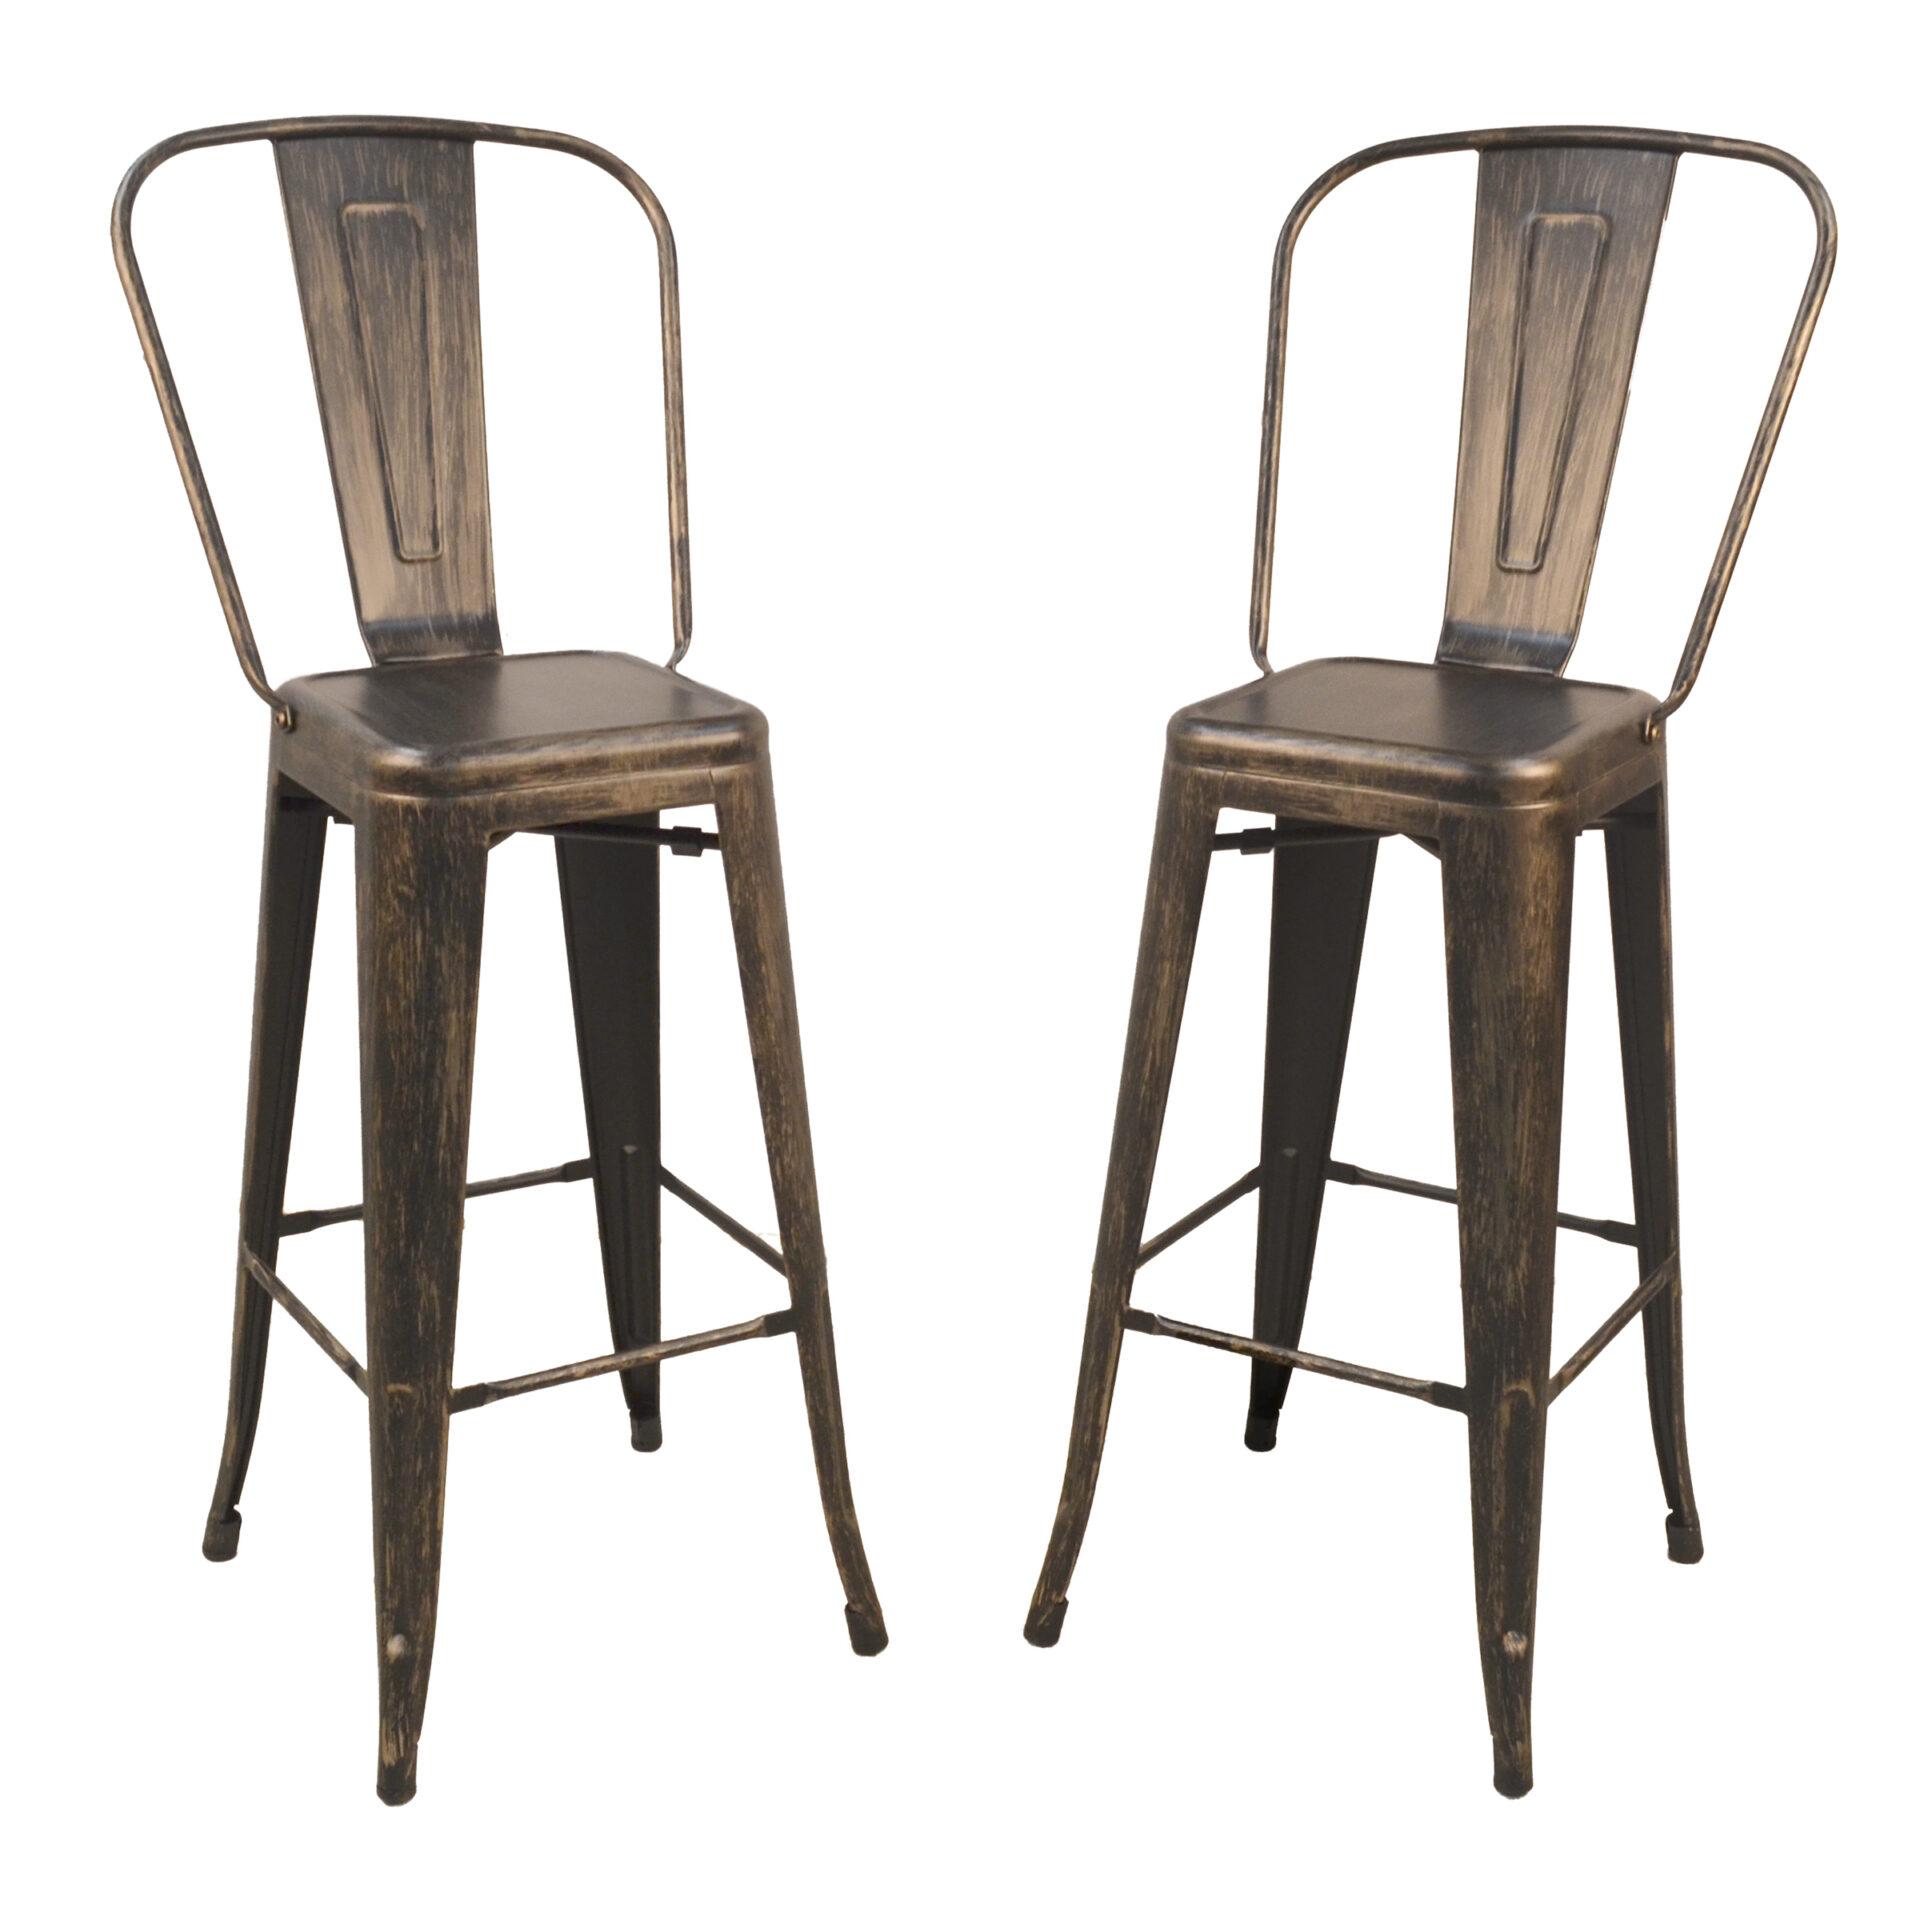 "Adeline 30"" Barstool Set of 2, Antique Copper"